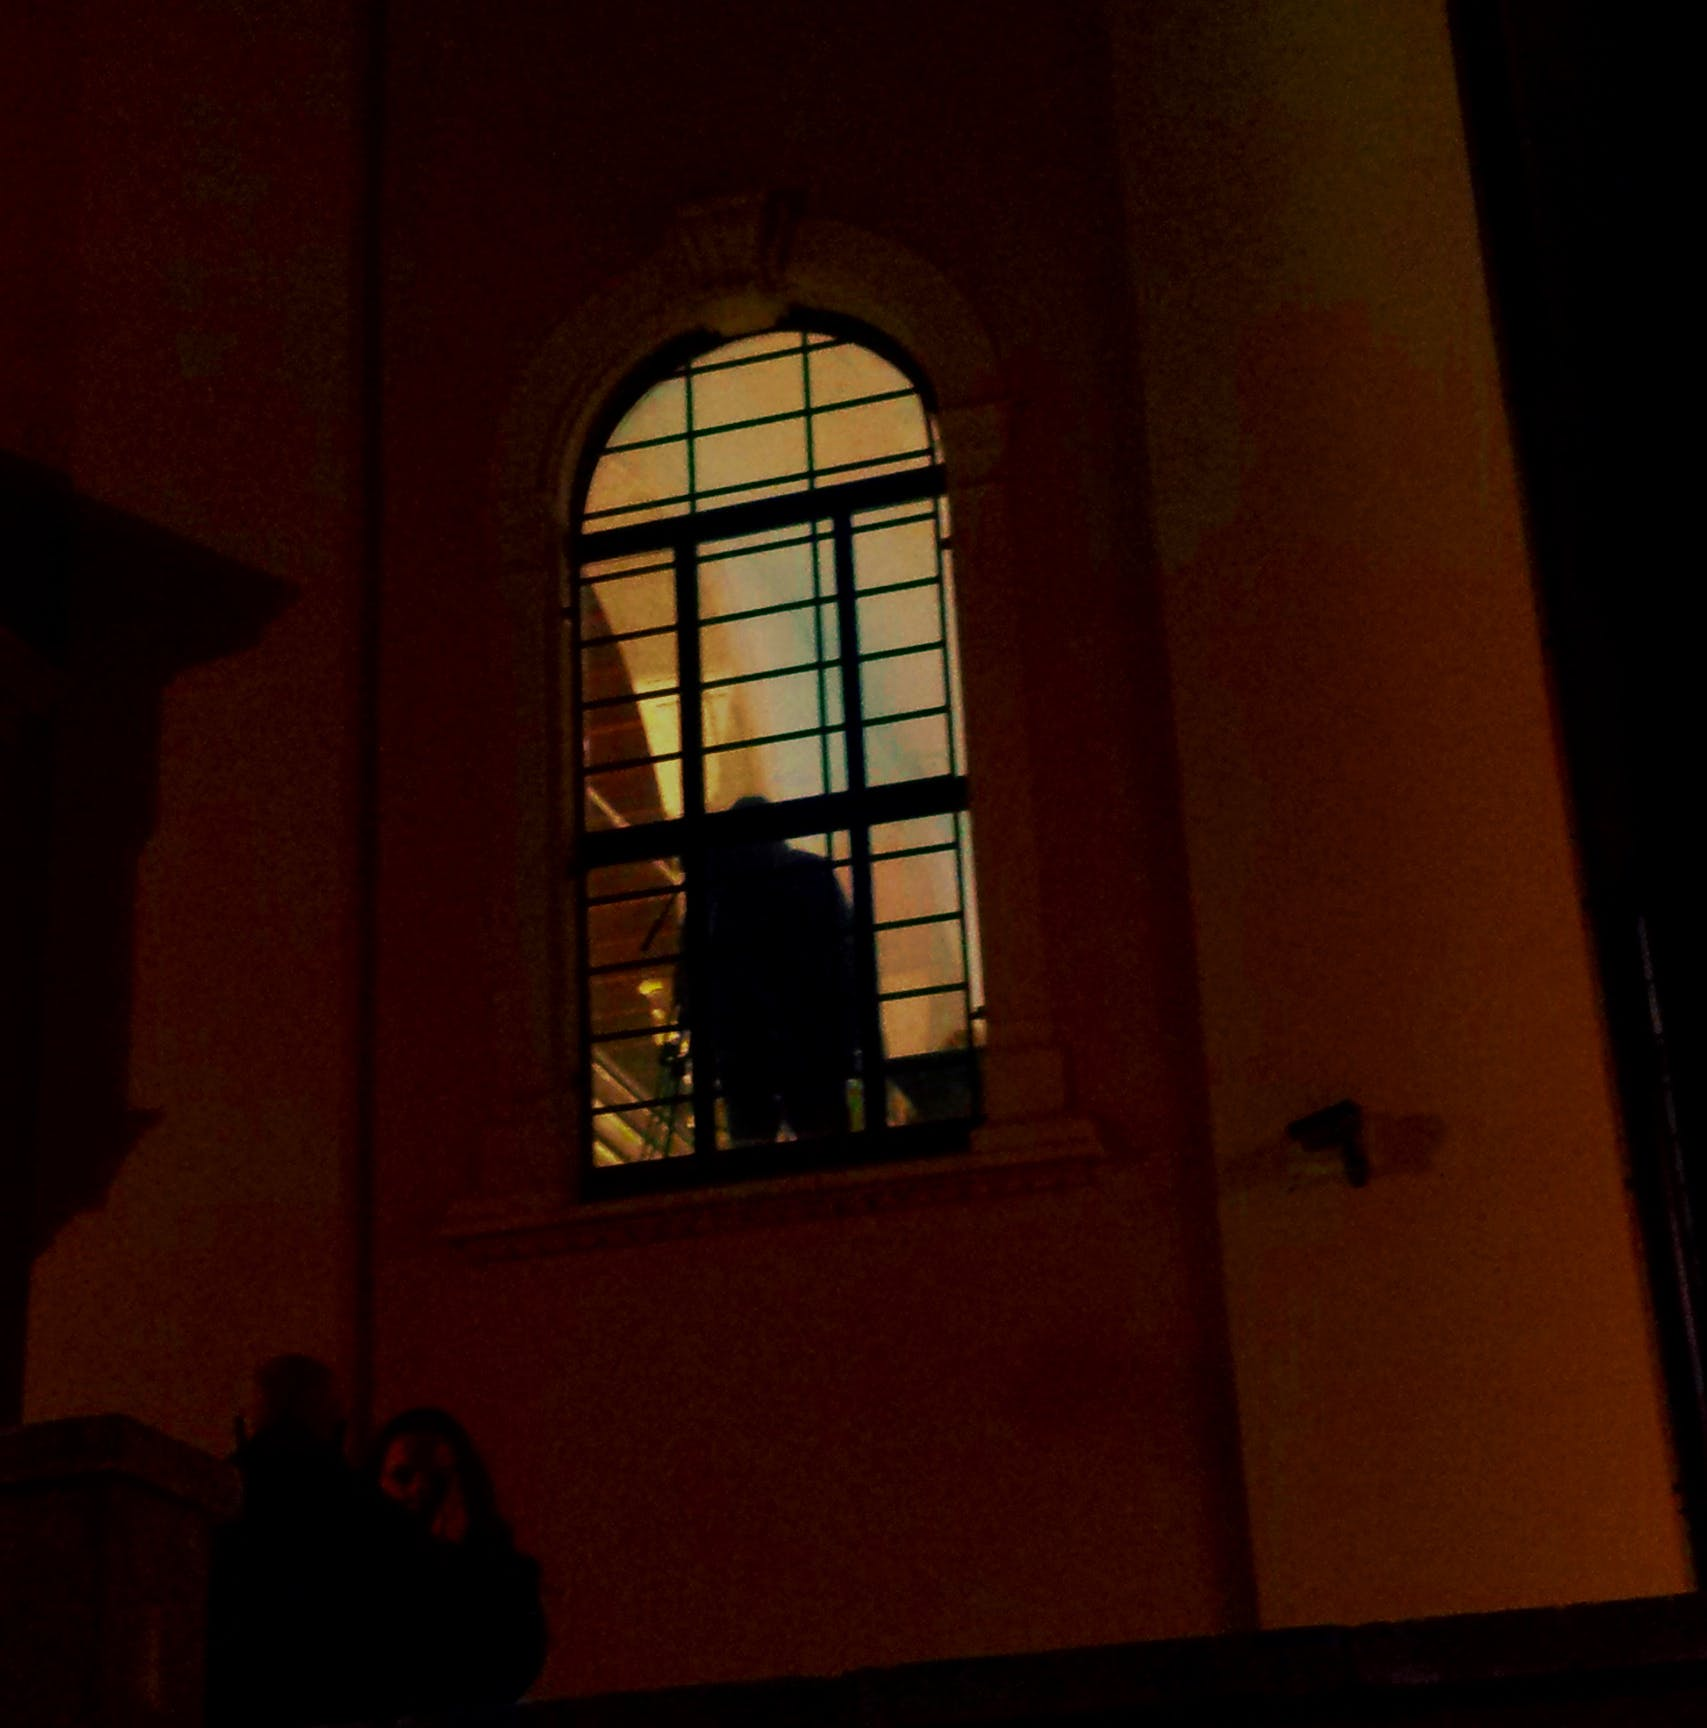 Free stock photo of night window